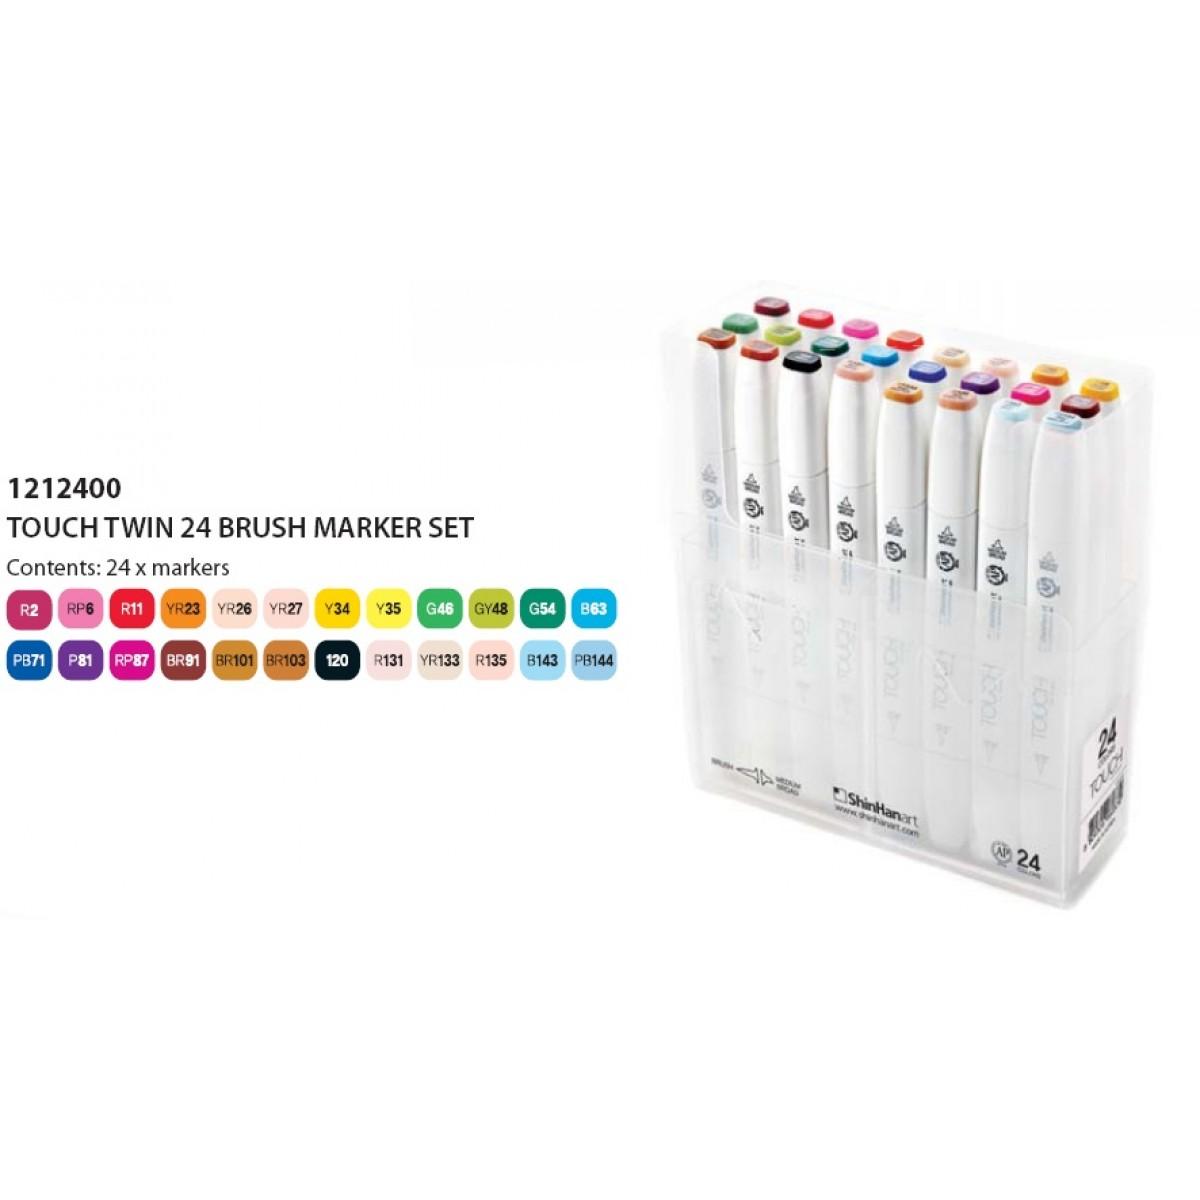 ShinHan Touch Twin Brush Marker Set 24